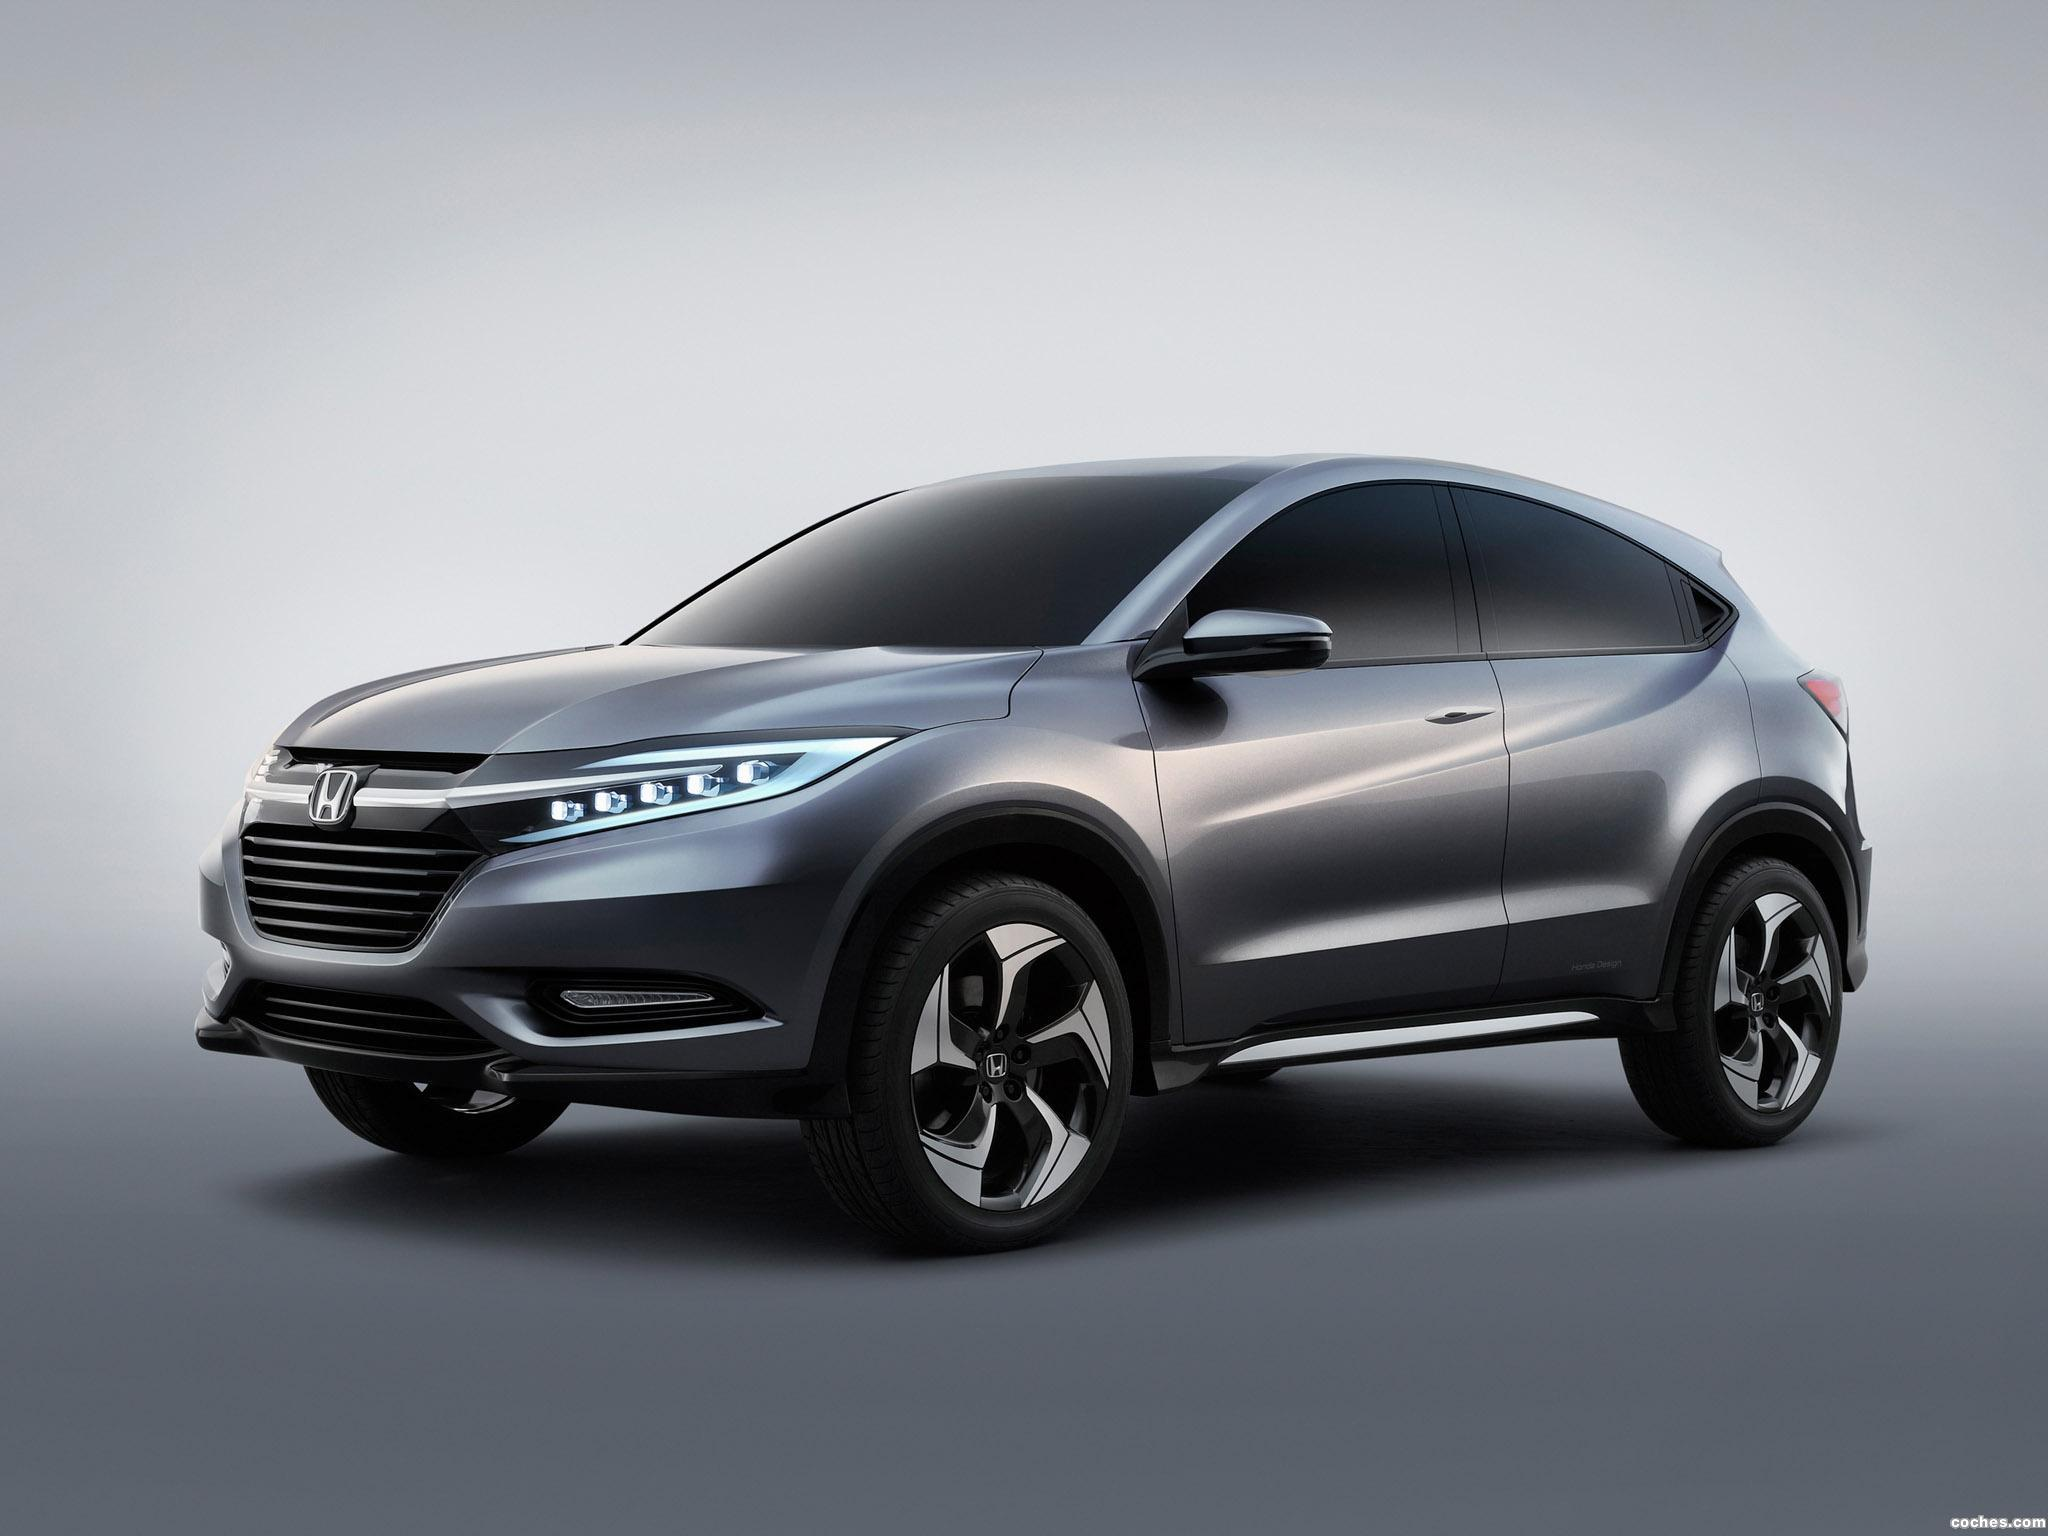 Foto 0 de Honda Urban SUV Concept 2013